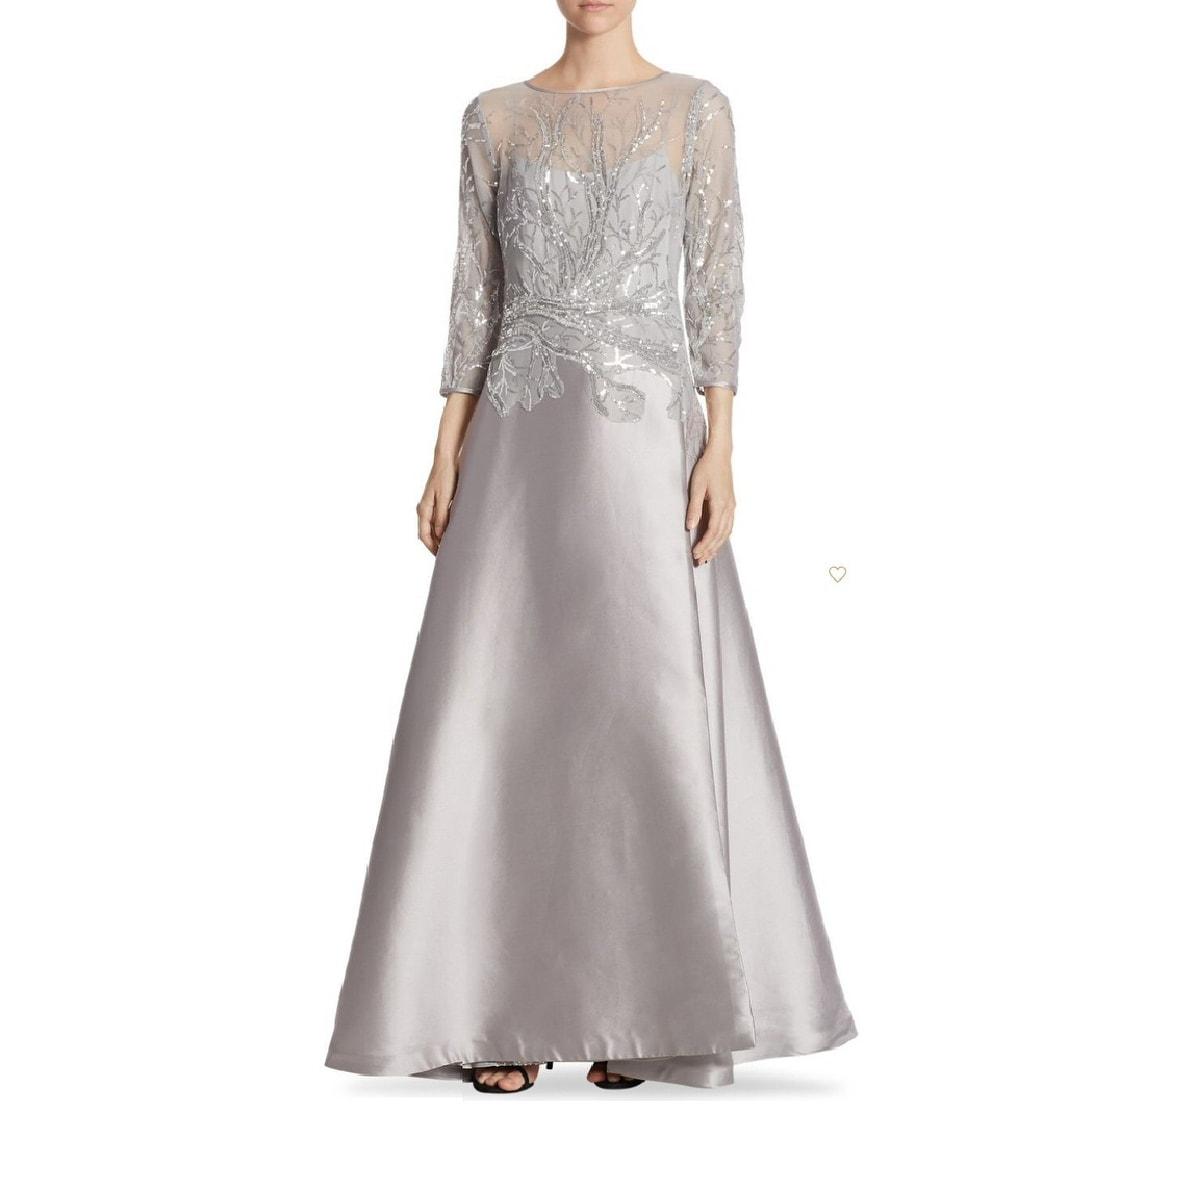 42ff0c0d4fd Ralph Lauren Evening Dresses At Nordstrom - Gomes Weine AG